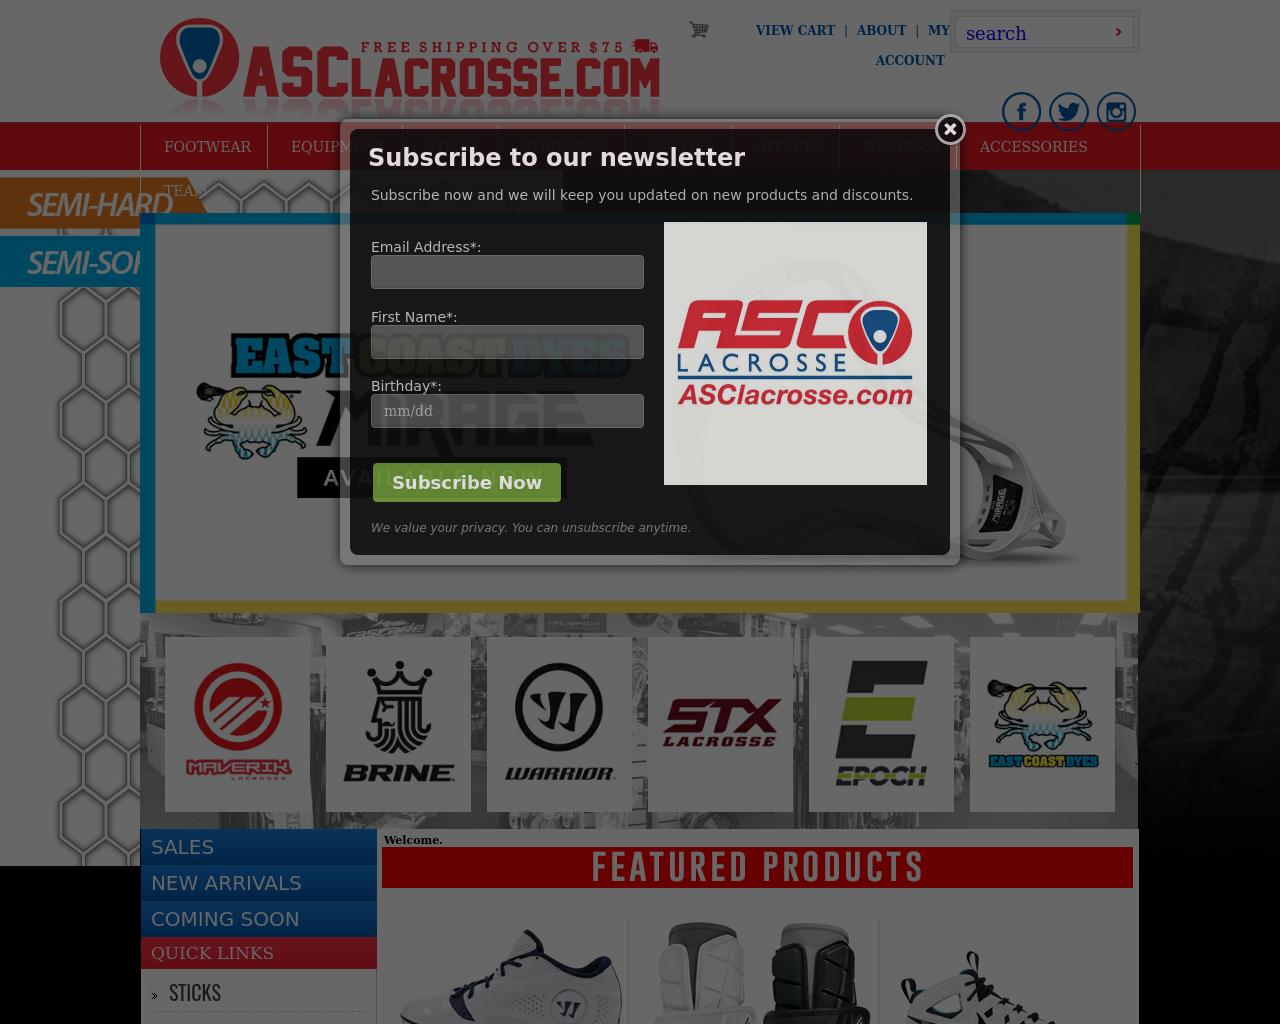 ASC-Lacrosse-Advertising-Reviews-Pricing